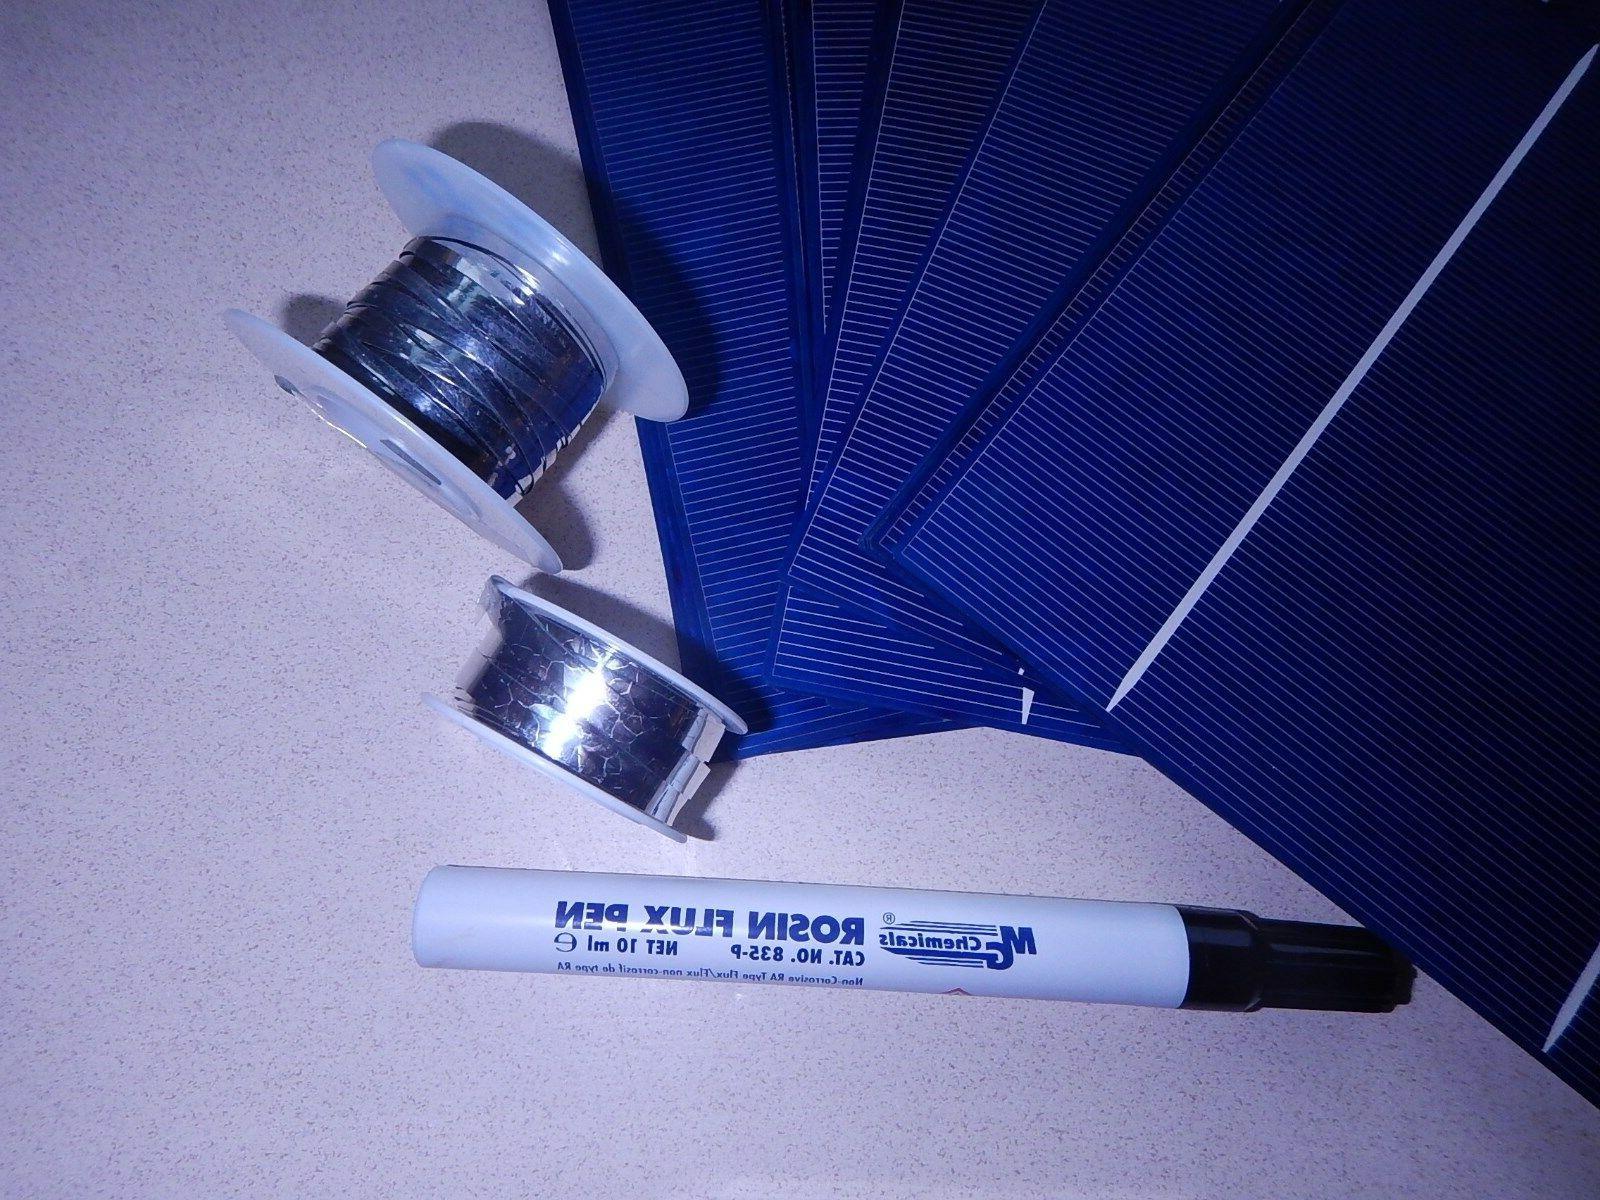 40 6x6 high solar kit-diy panels,jbx,flux wire